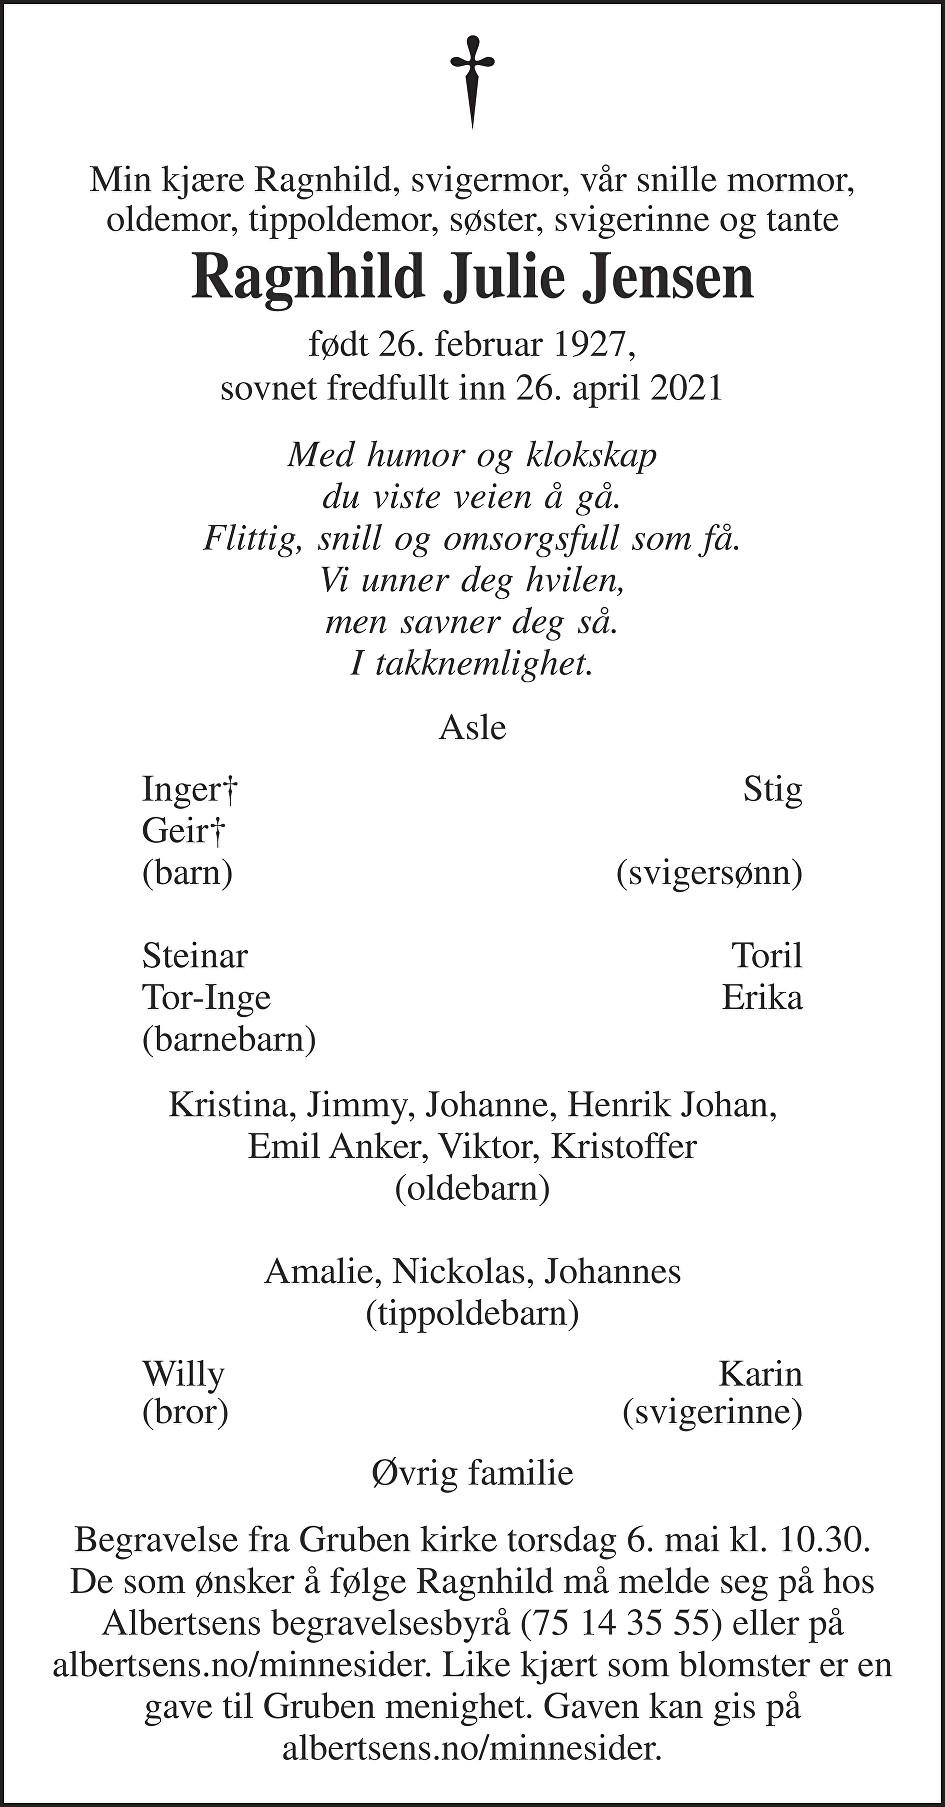 Ragnhild Julie Jensen Dødsannonse